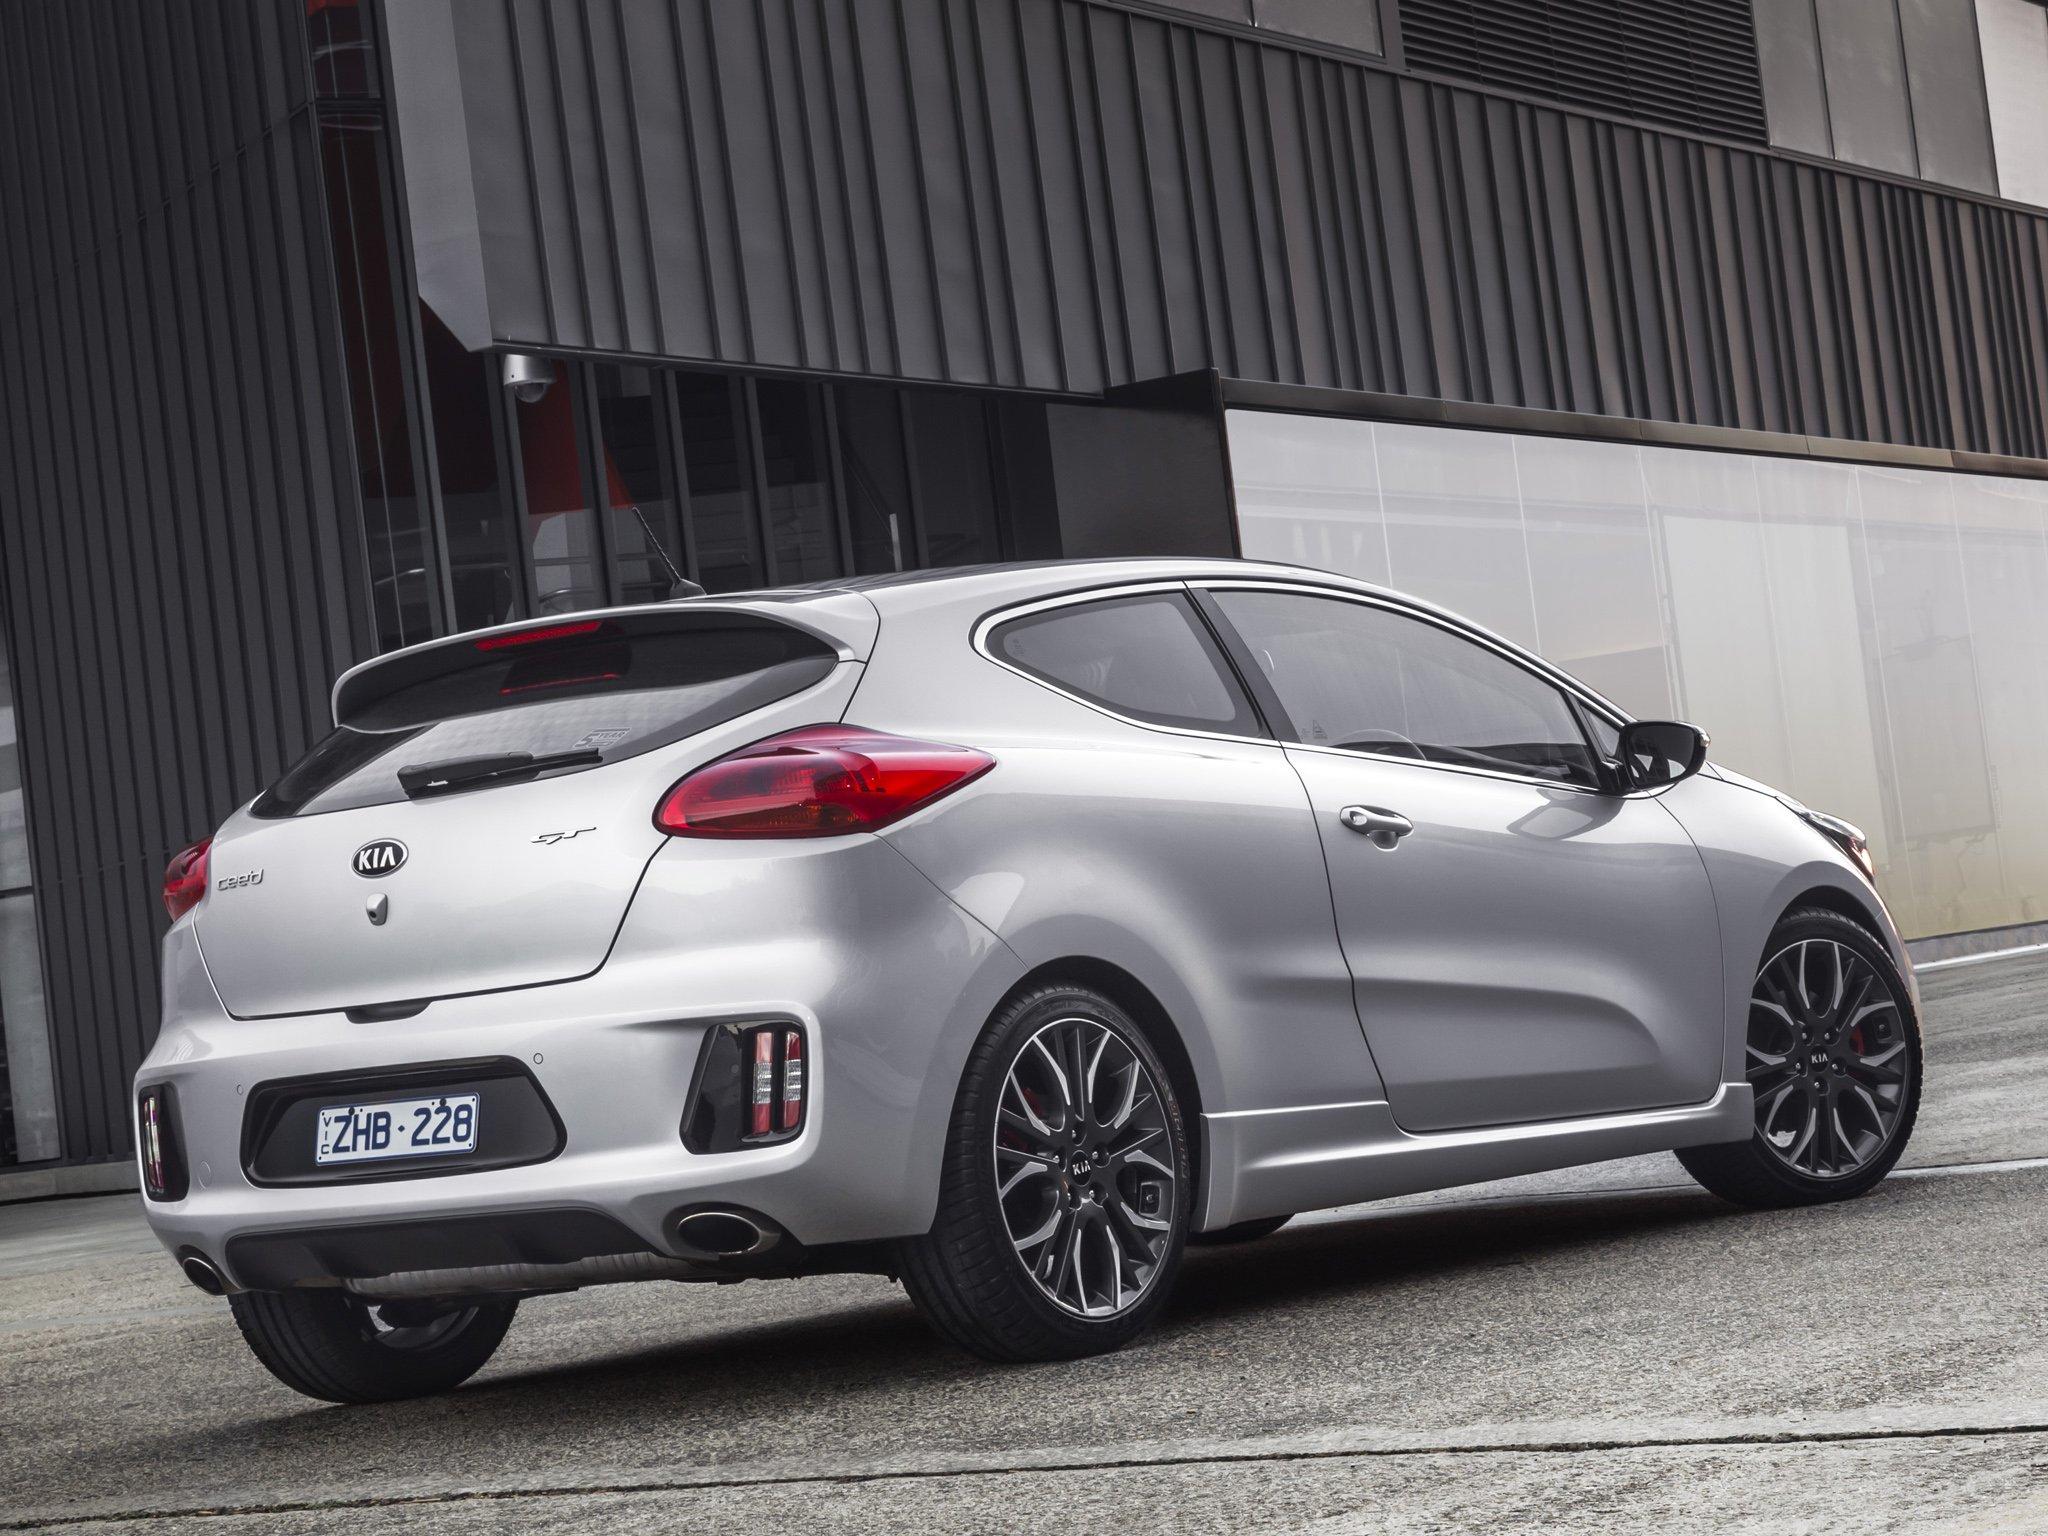 Model 2014 Kia Proceed GT AUspec Pro Ceed H Wallpaper